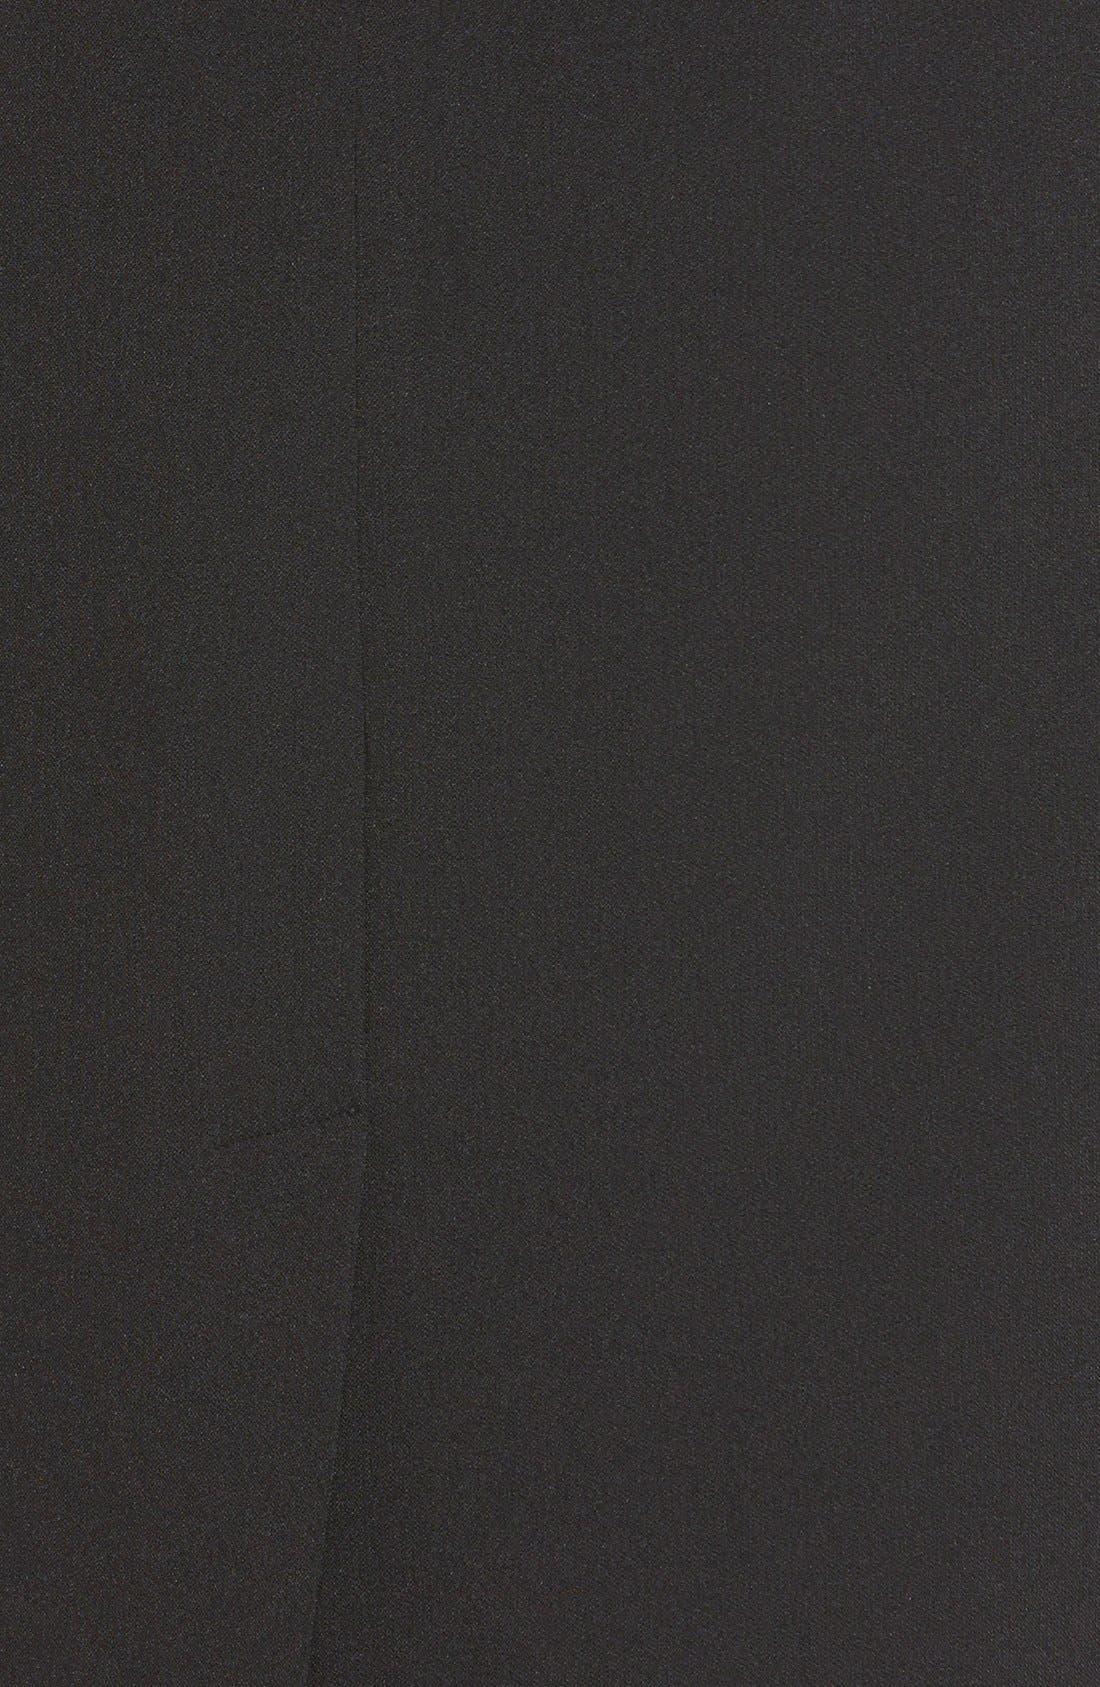 ADRIANNA PAPELL,                             Scalloped Crepe Sheath Dress,                             Alternate thumbnail 8, color,                             001